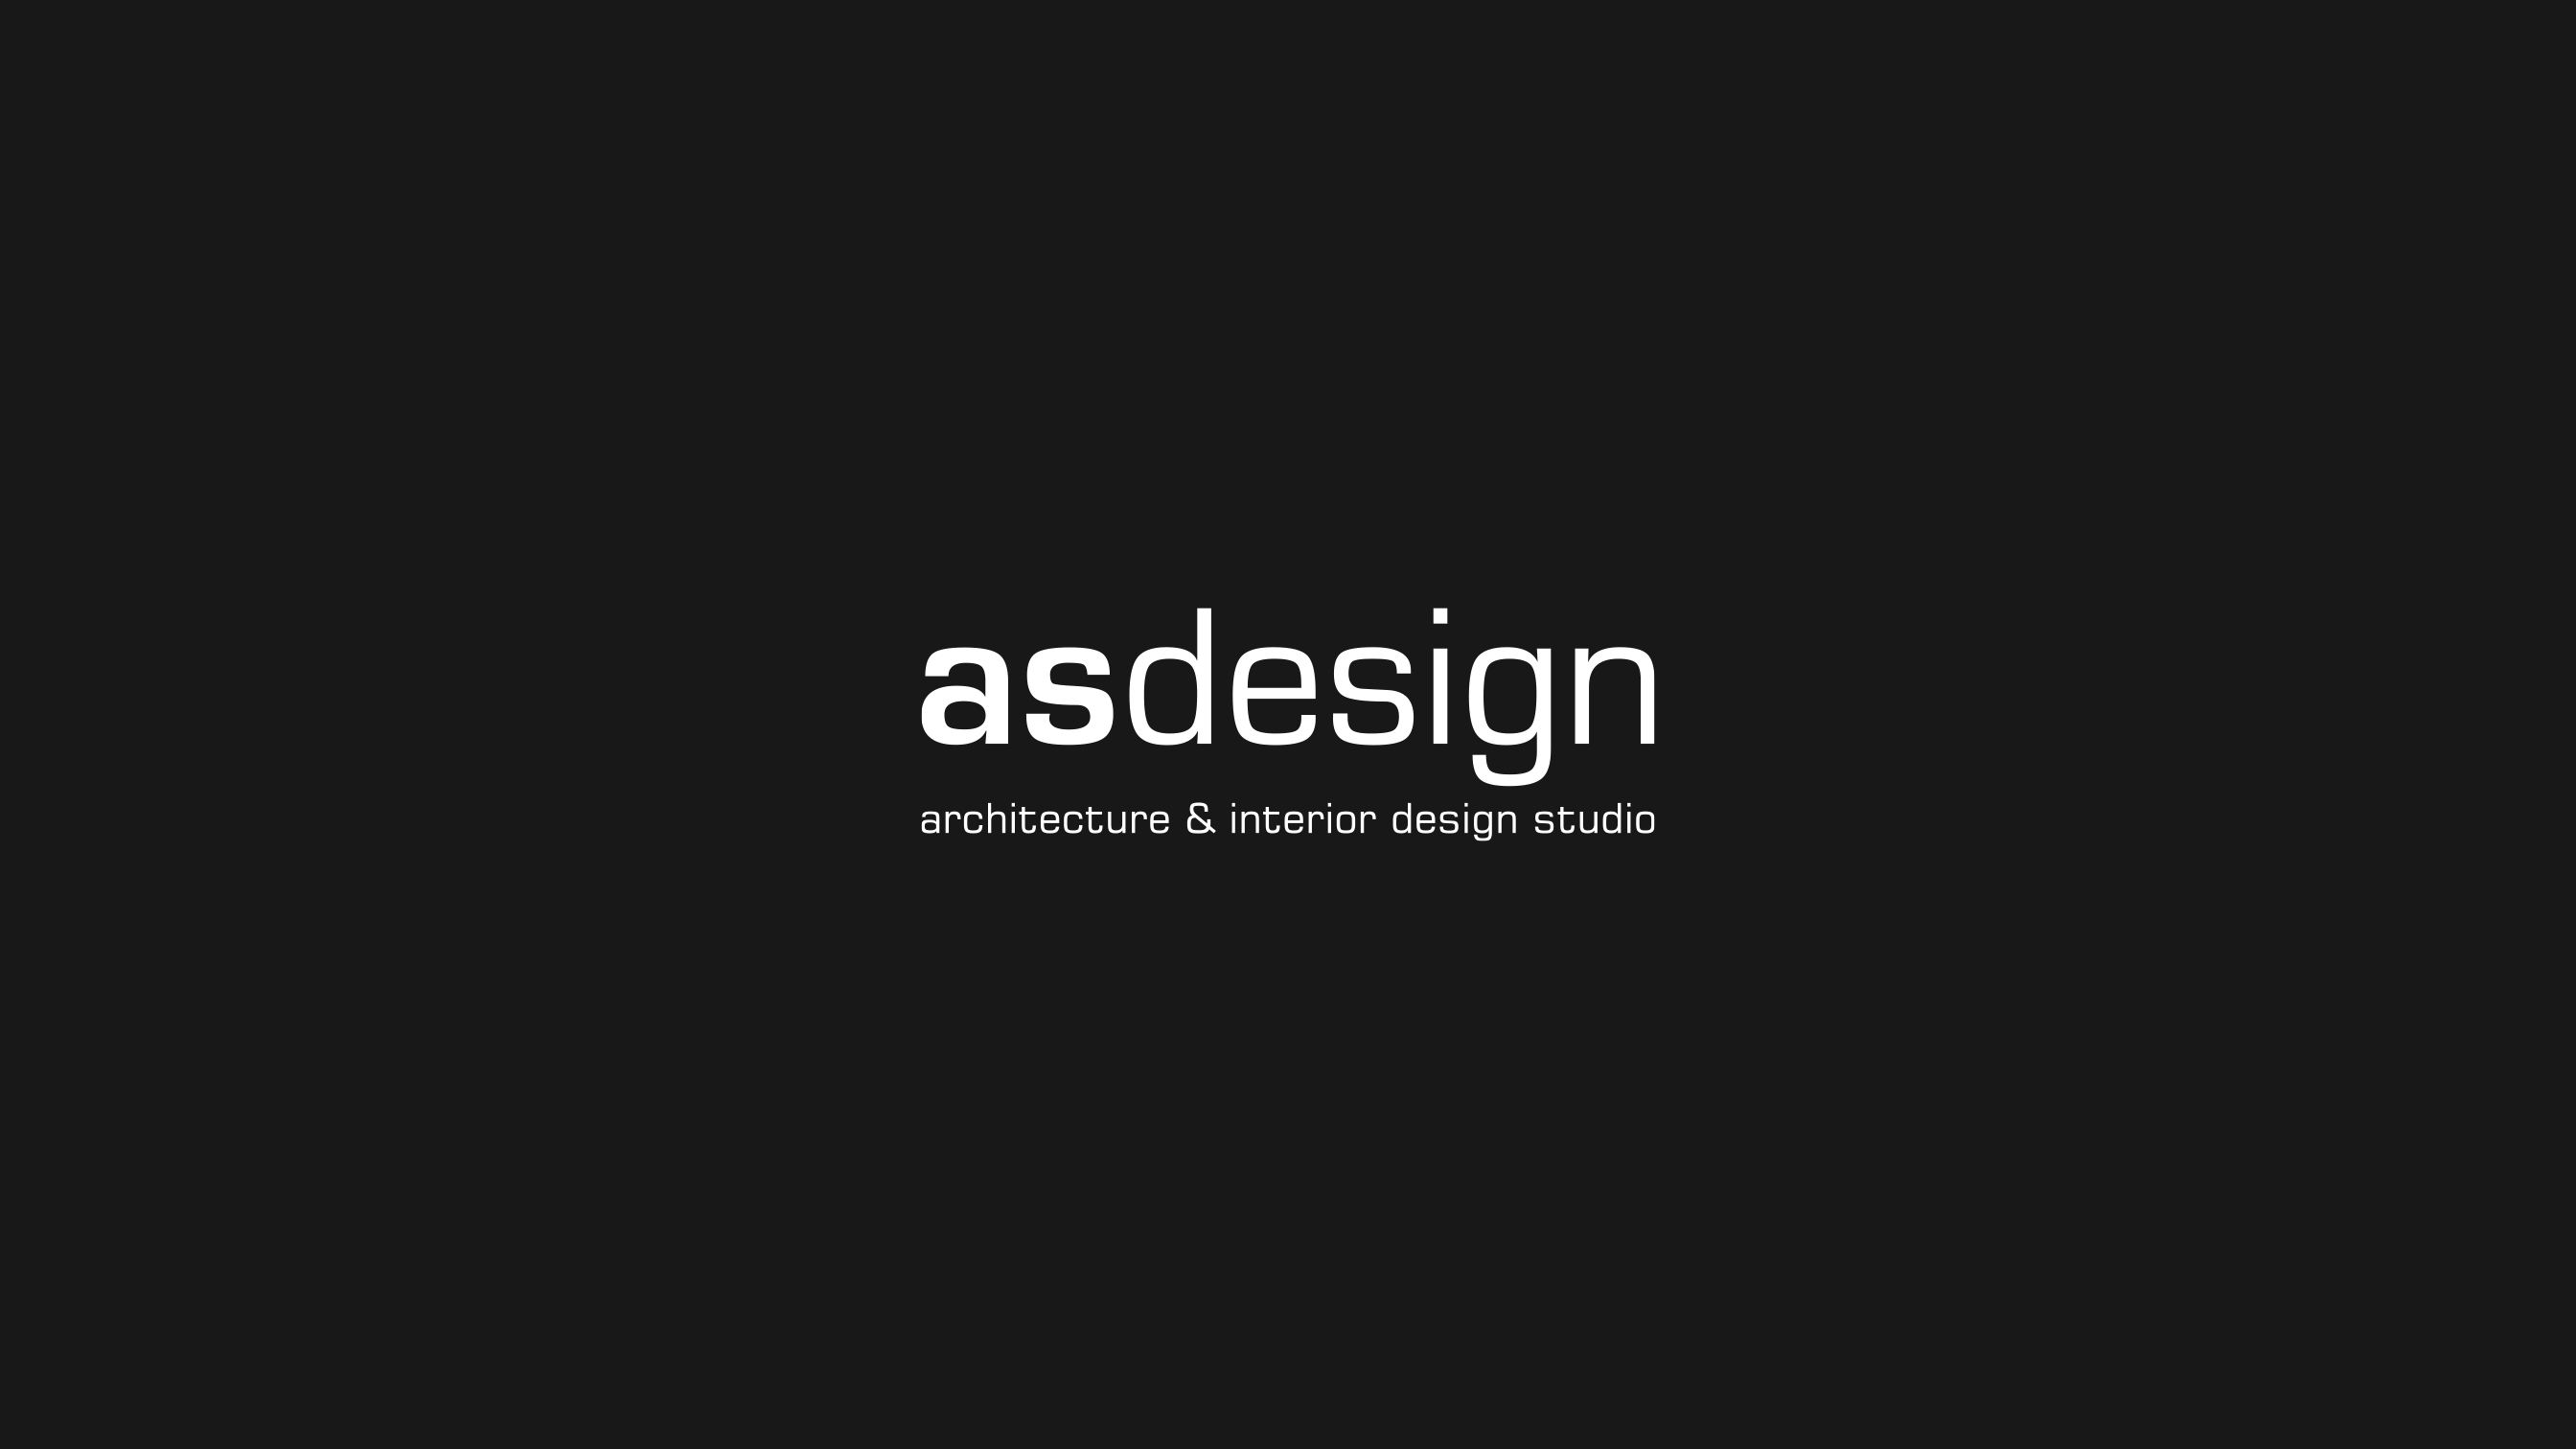 showcase-logotype-as-design